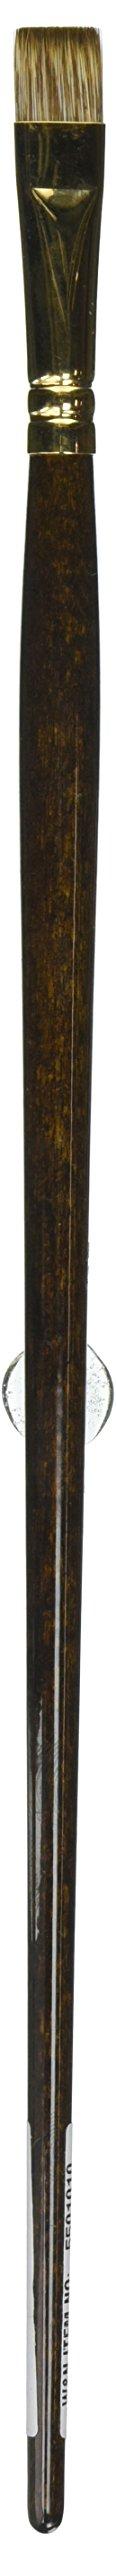 Winsor & Newton 5501010 Monarch Bright Long Handle Brush, Size 10